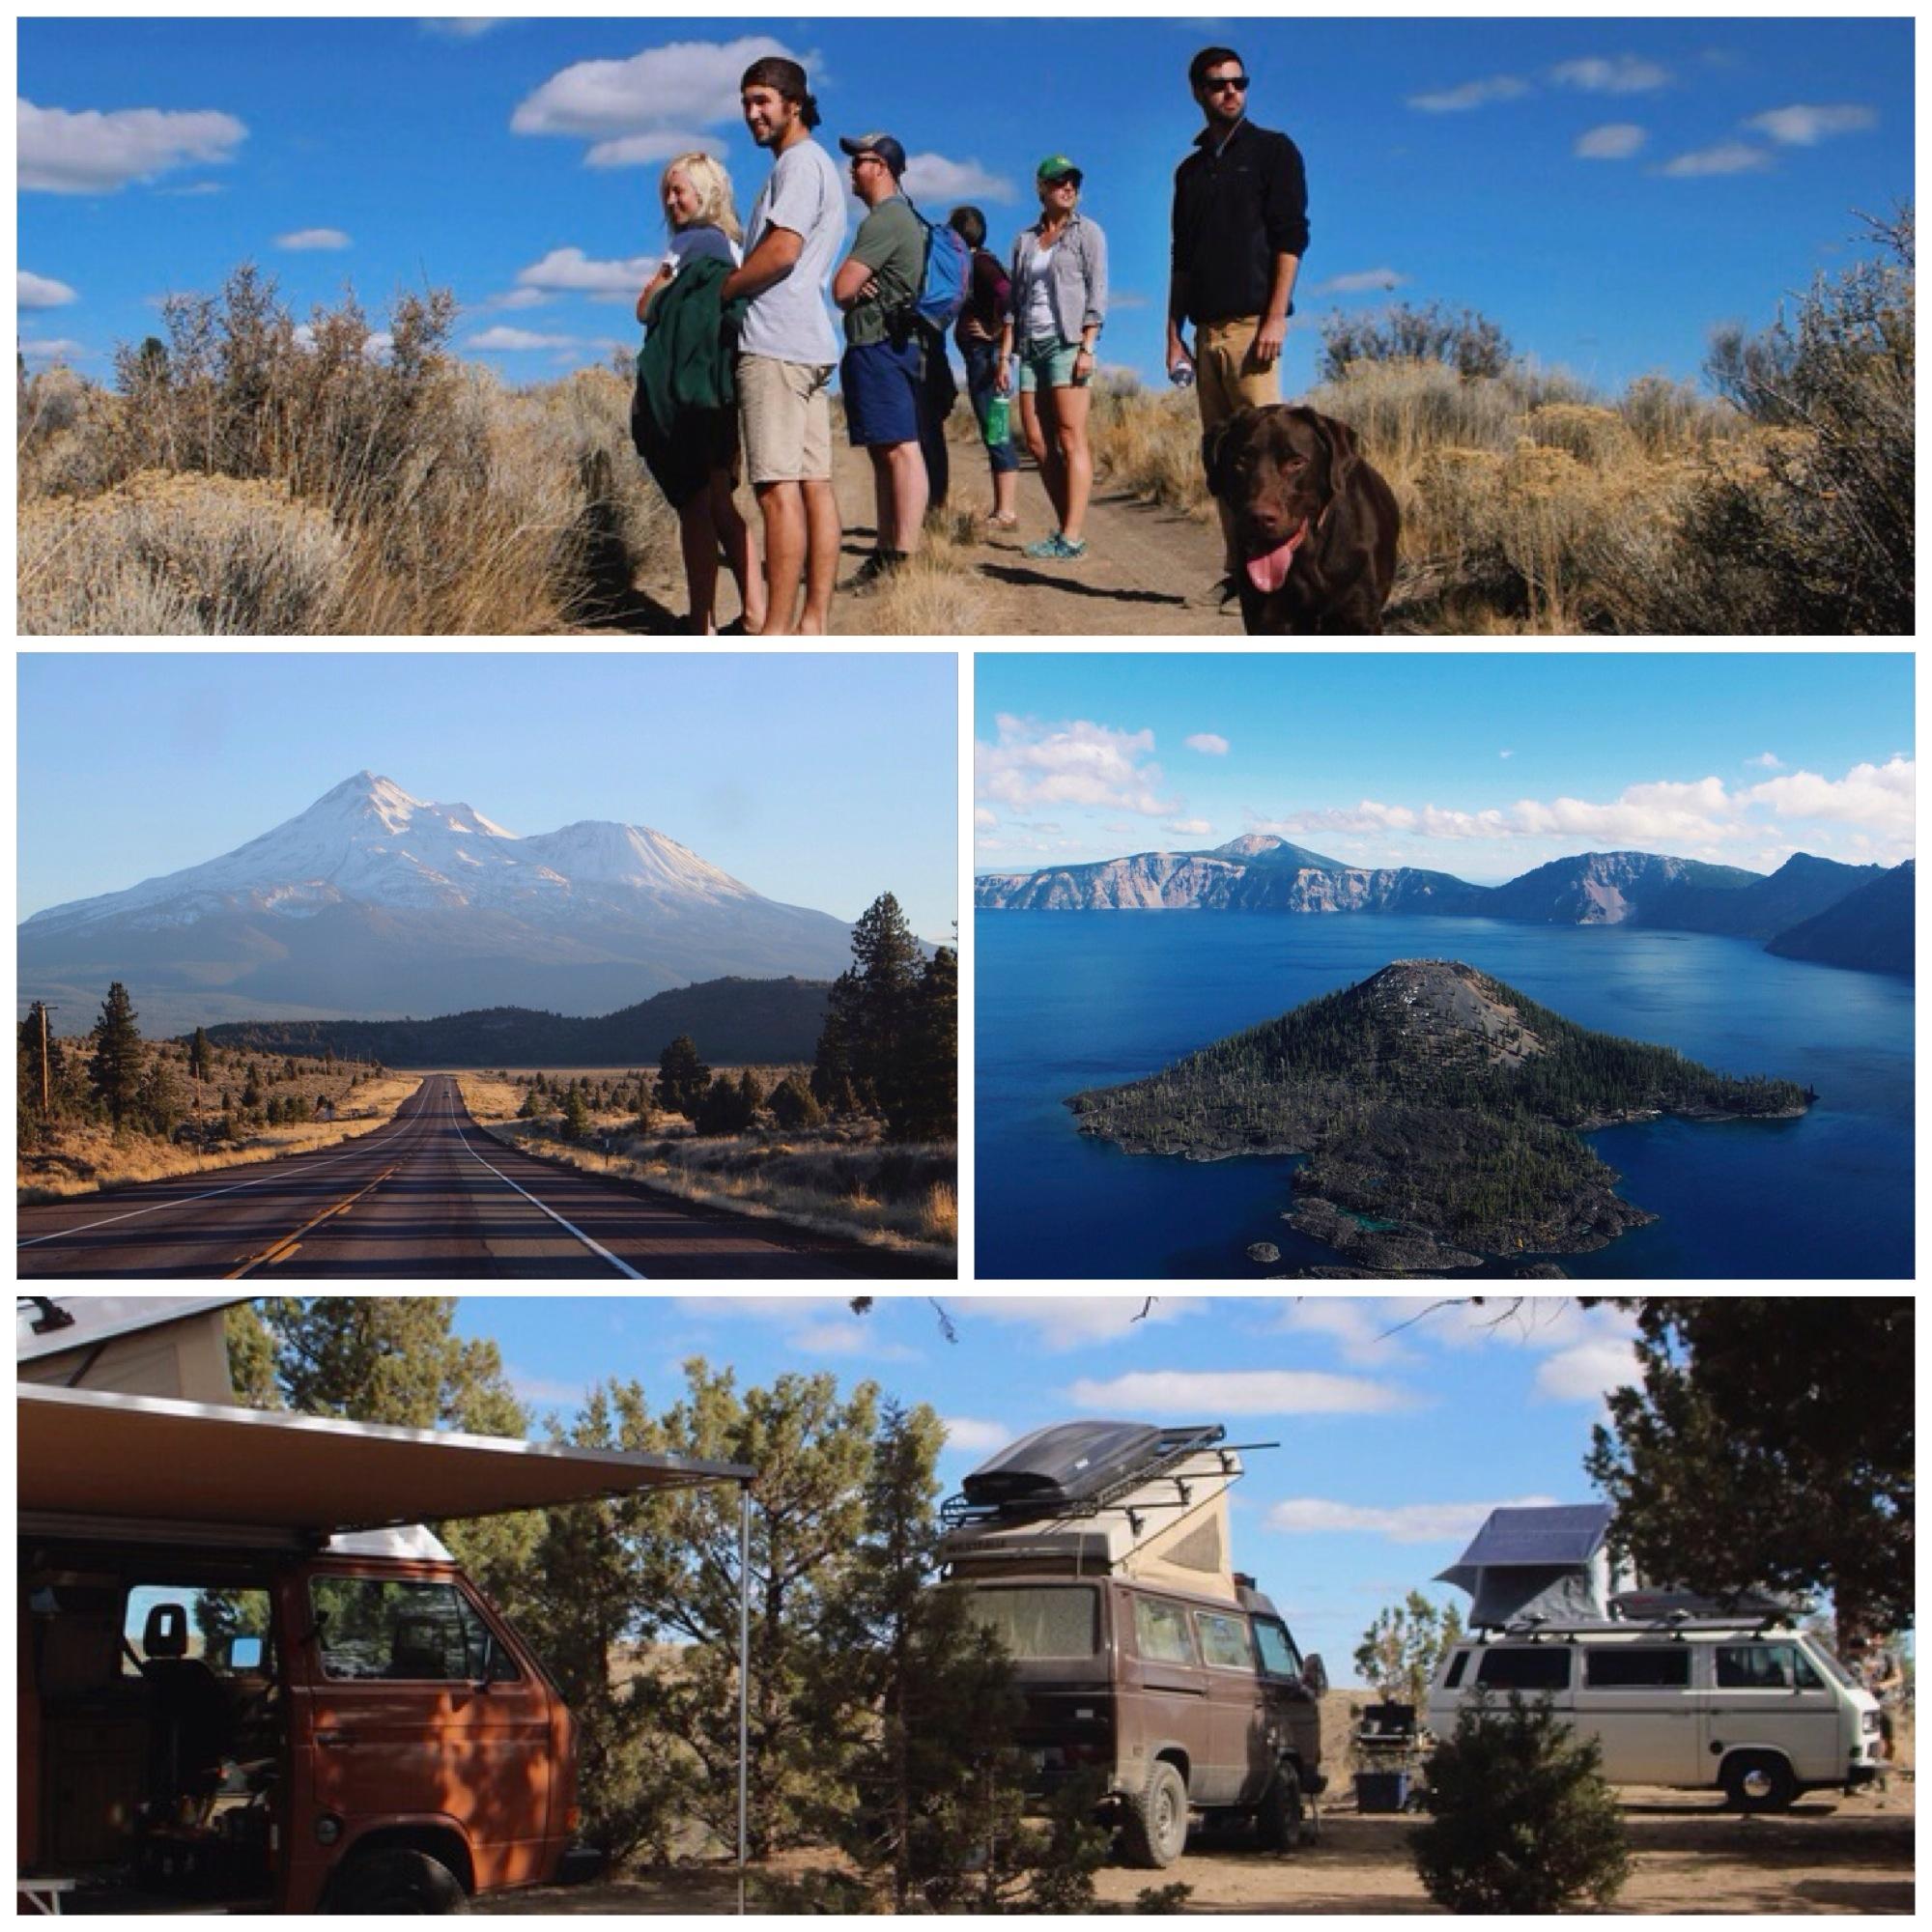 Amazing people, amazing views andamazing vans: unforgettable experiences.